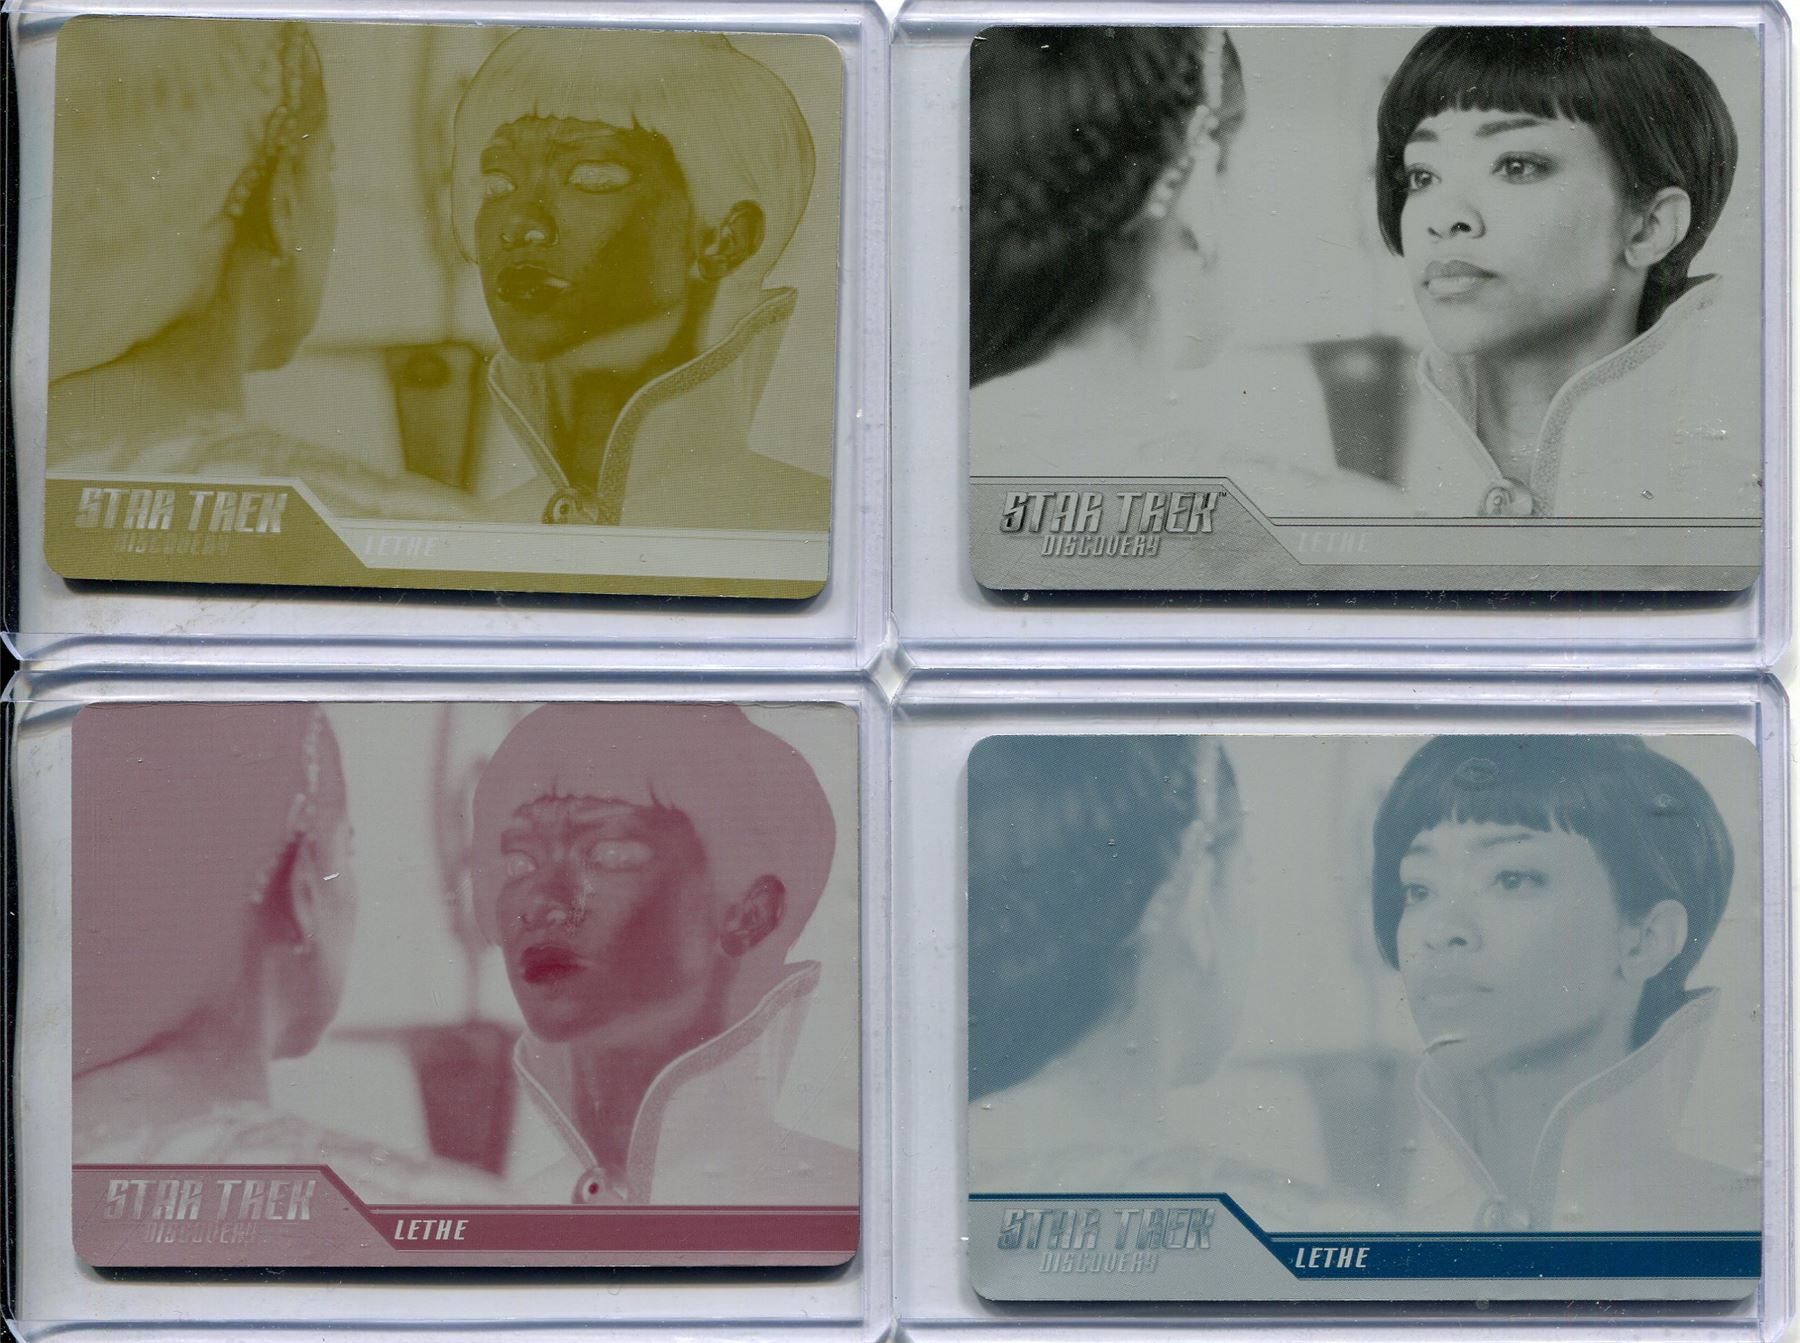 Star Trek TOS Archives /& Inscriptions Base Card #52 Variant 1